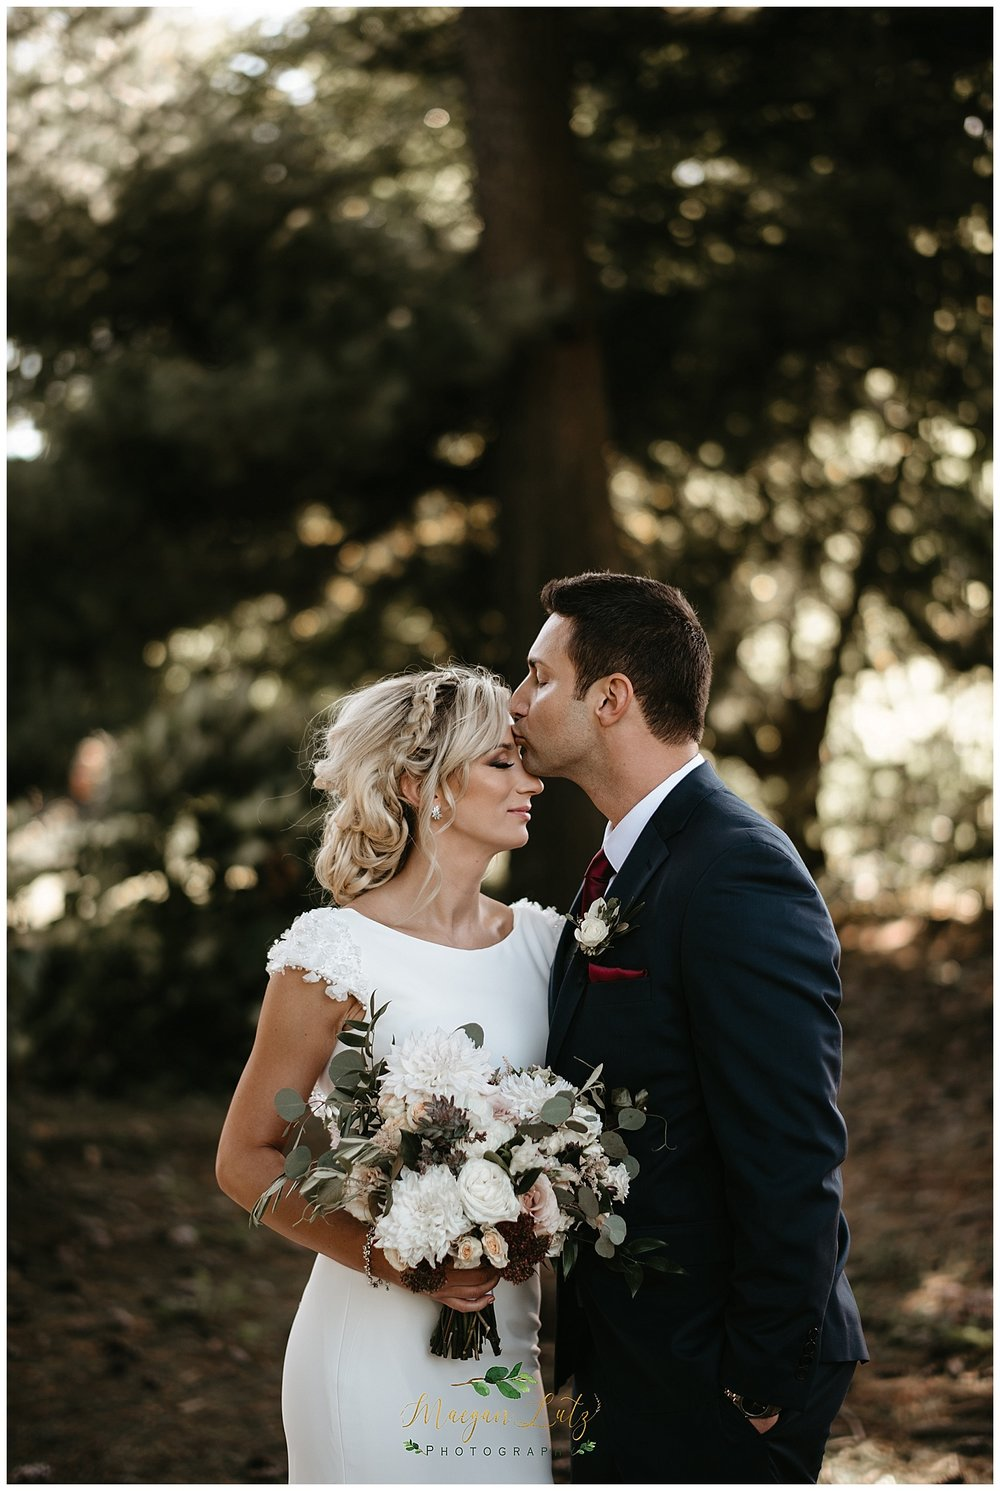 NEPA-wedding-photographer-at-Tyler-Arboretum-Media-PA_0017.jpg